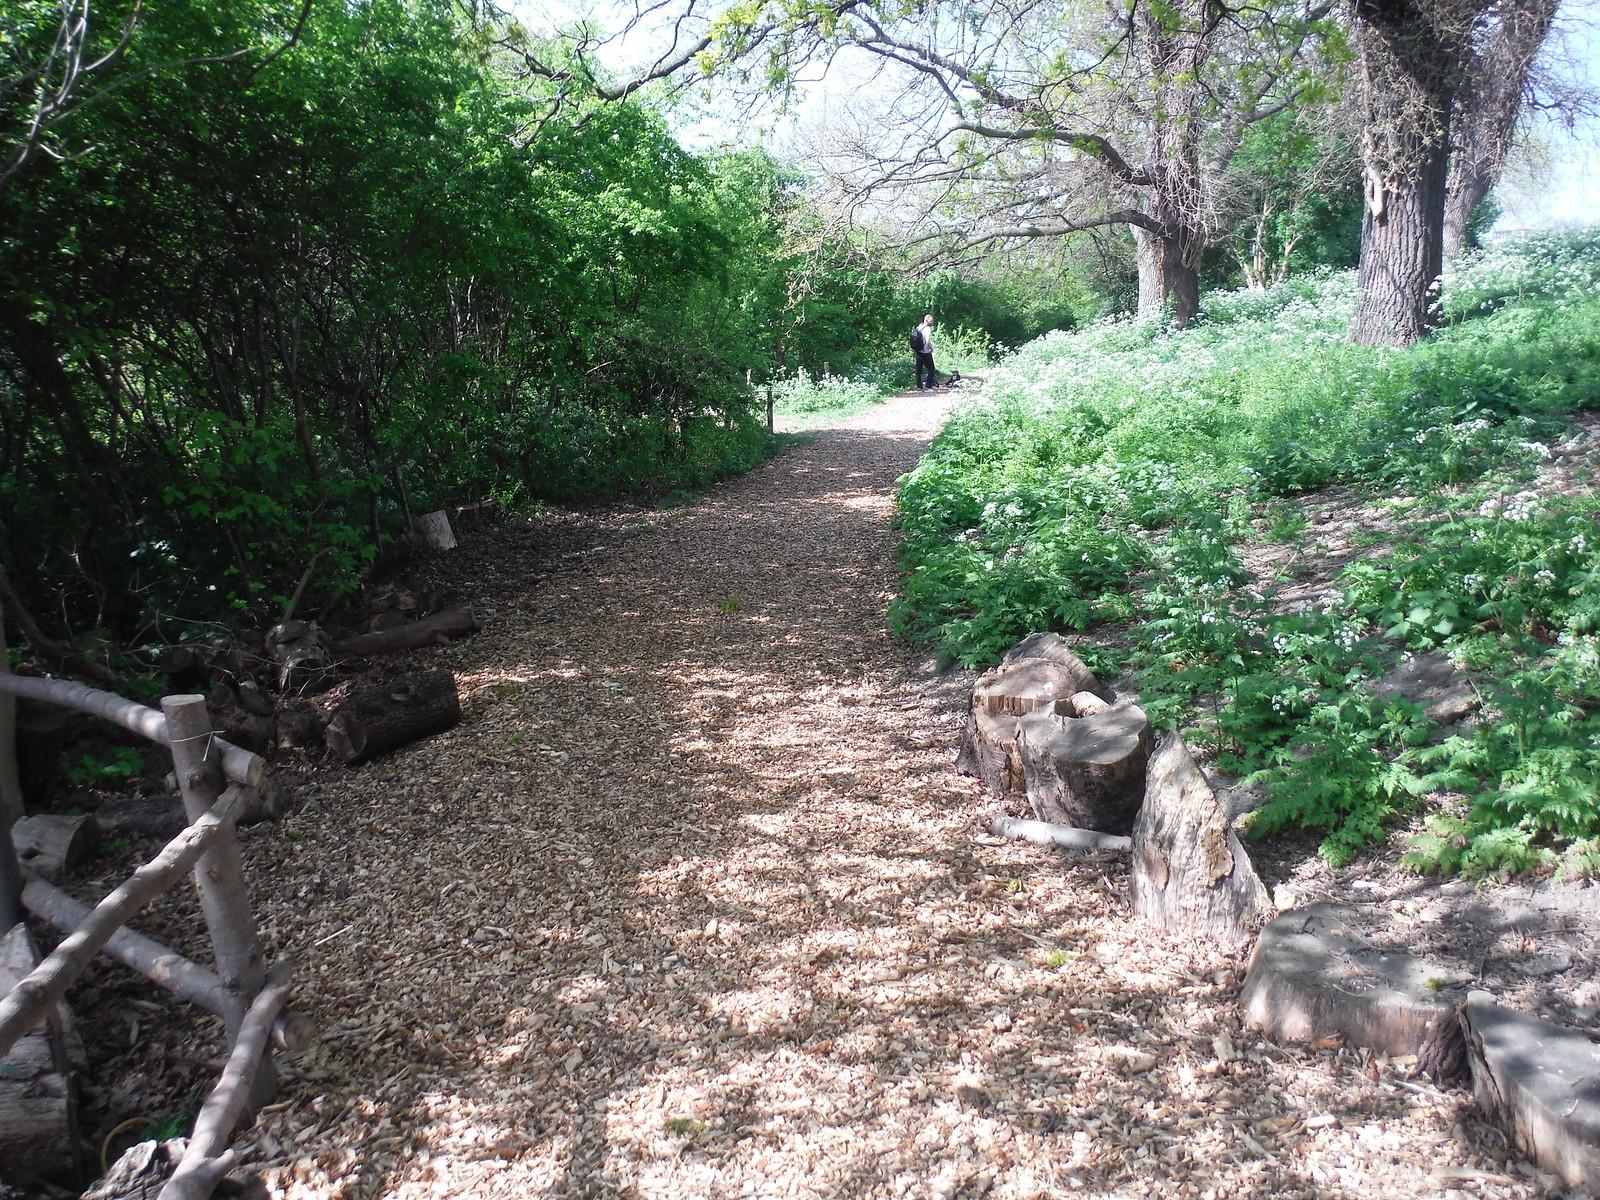 Woodland Trail (I), Woodberry Wetlands SWC Short Walk 26 - Woodberry Wetlands (Stoke Newington Reservoirs)